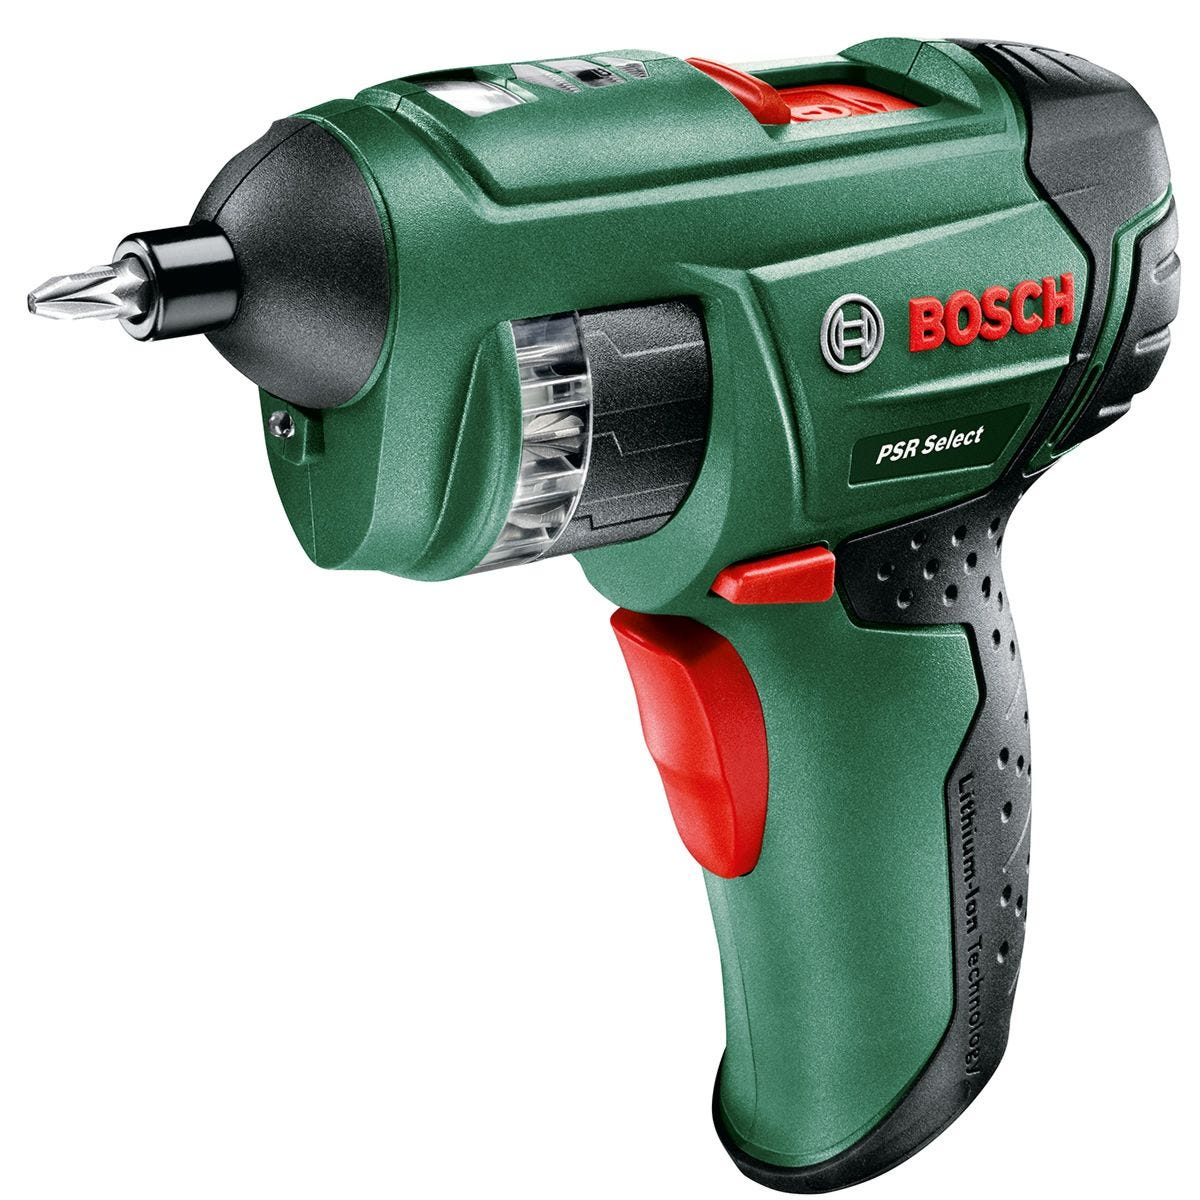 Bosch PSR Select Cordless Screwdriver